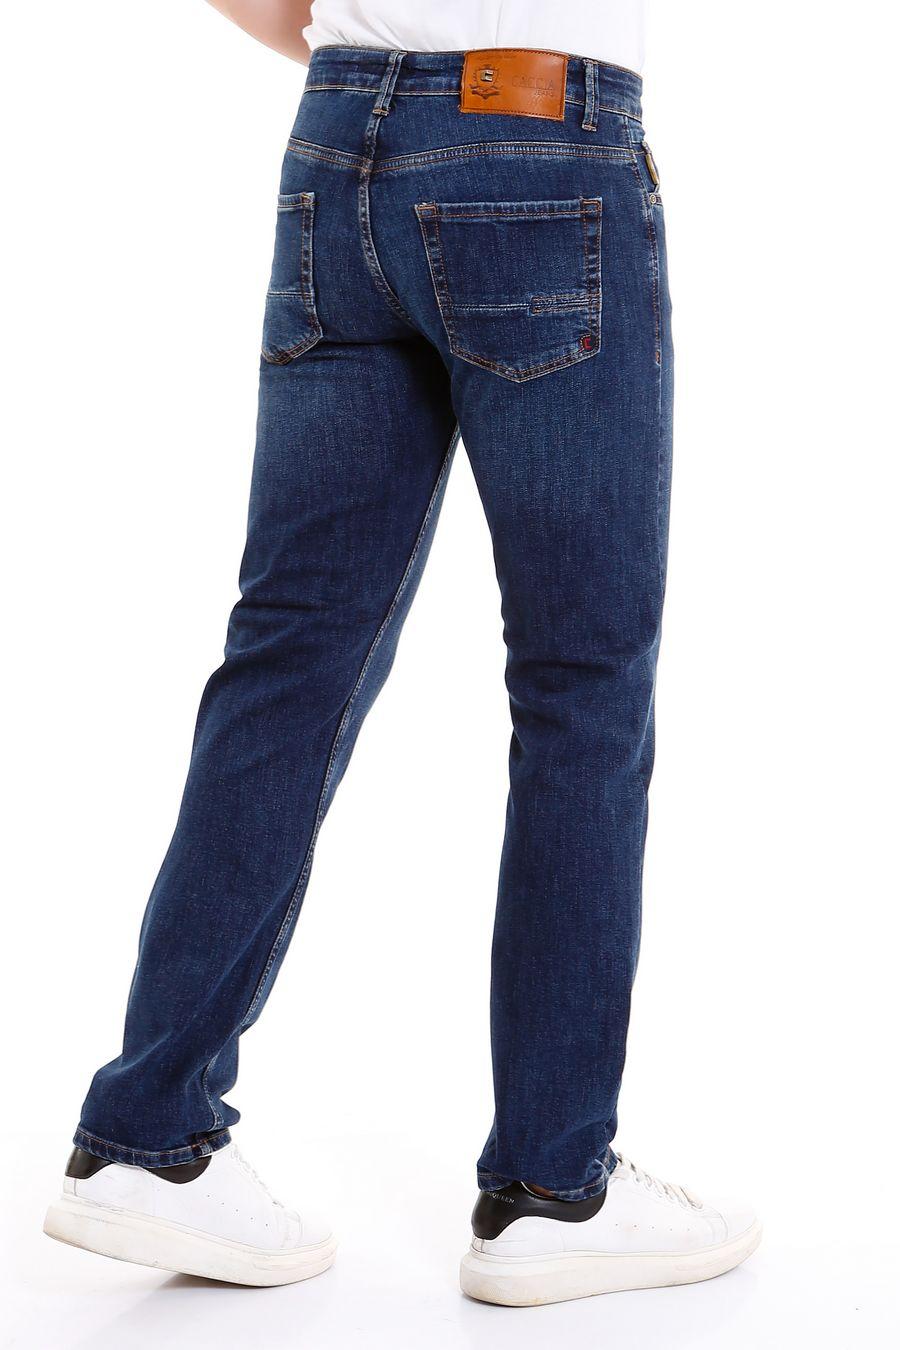 Джинсы мужские Caccia 2058 Blue - фото 3